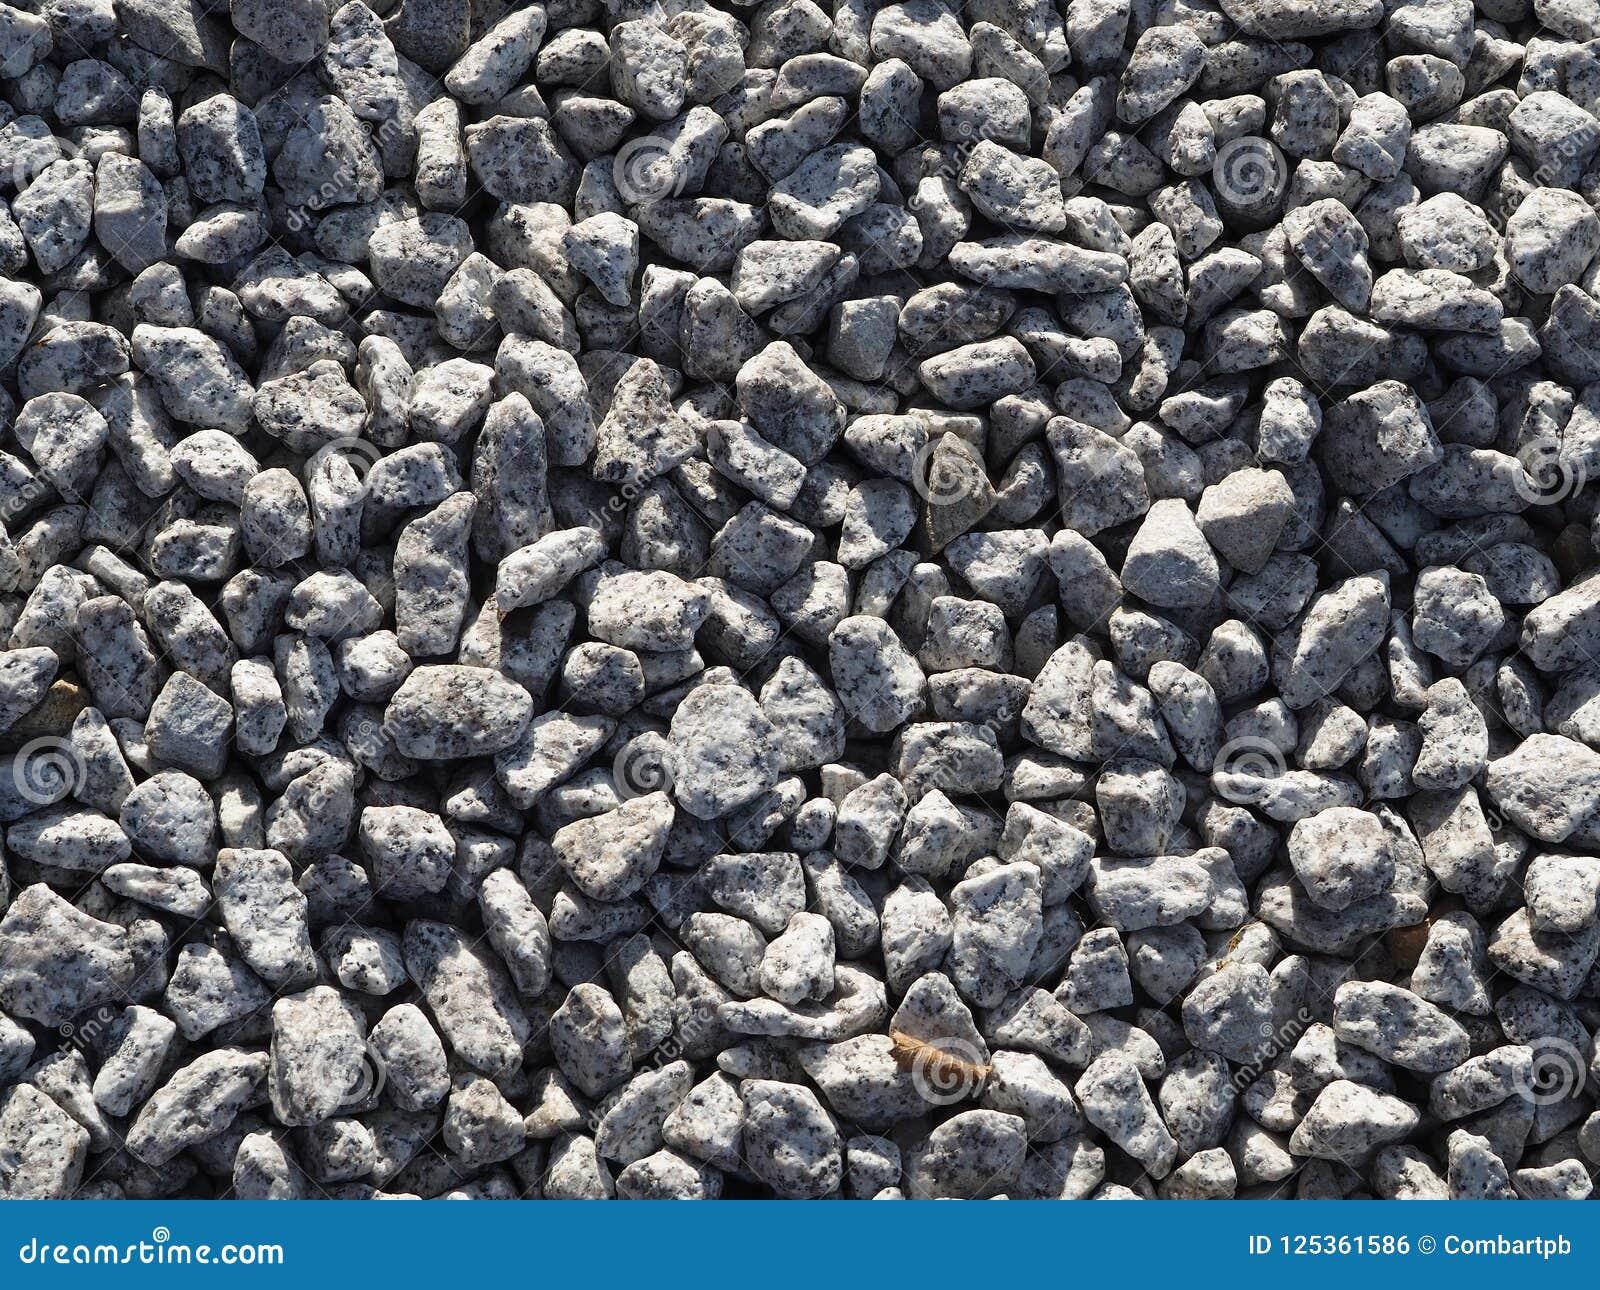 Gray gravel background - small stones. Stone aggregate.